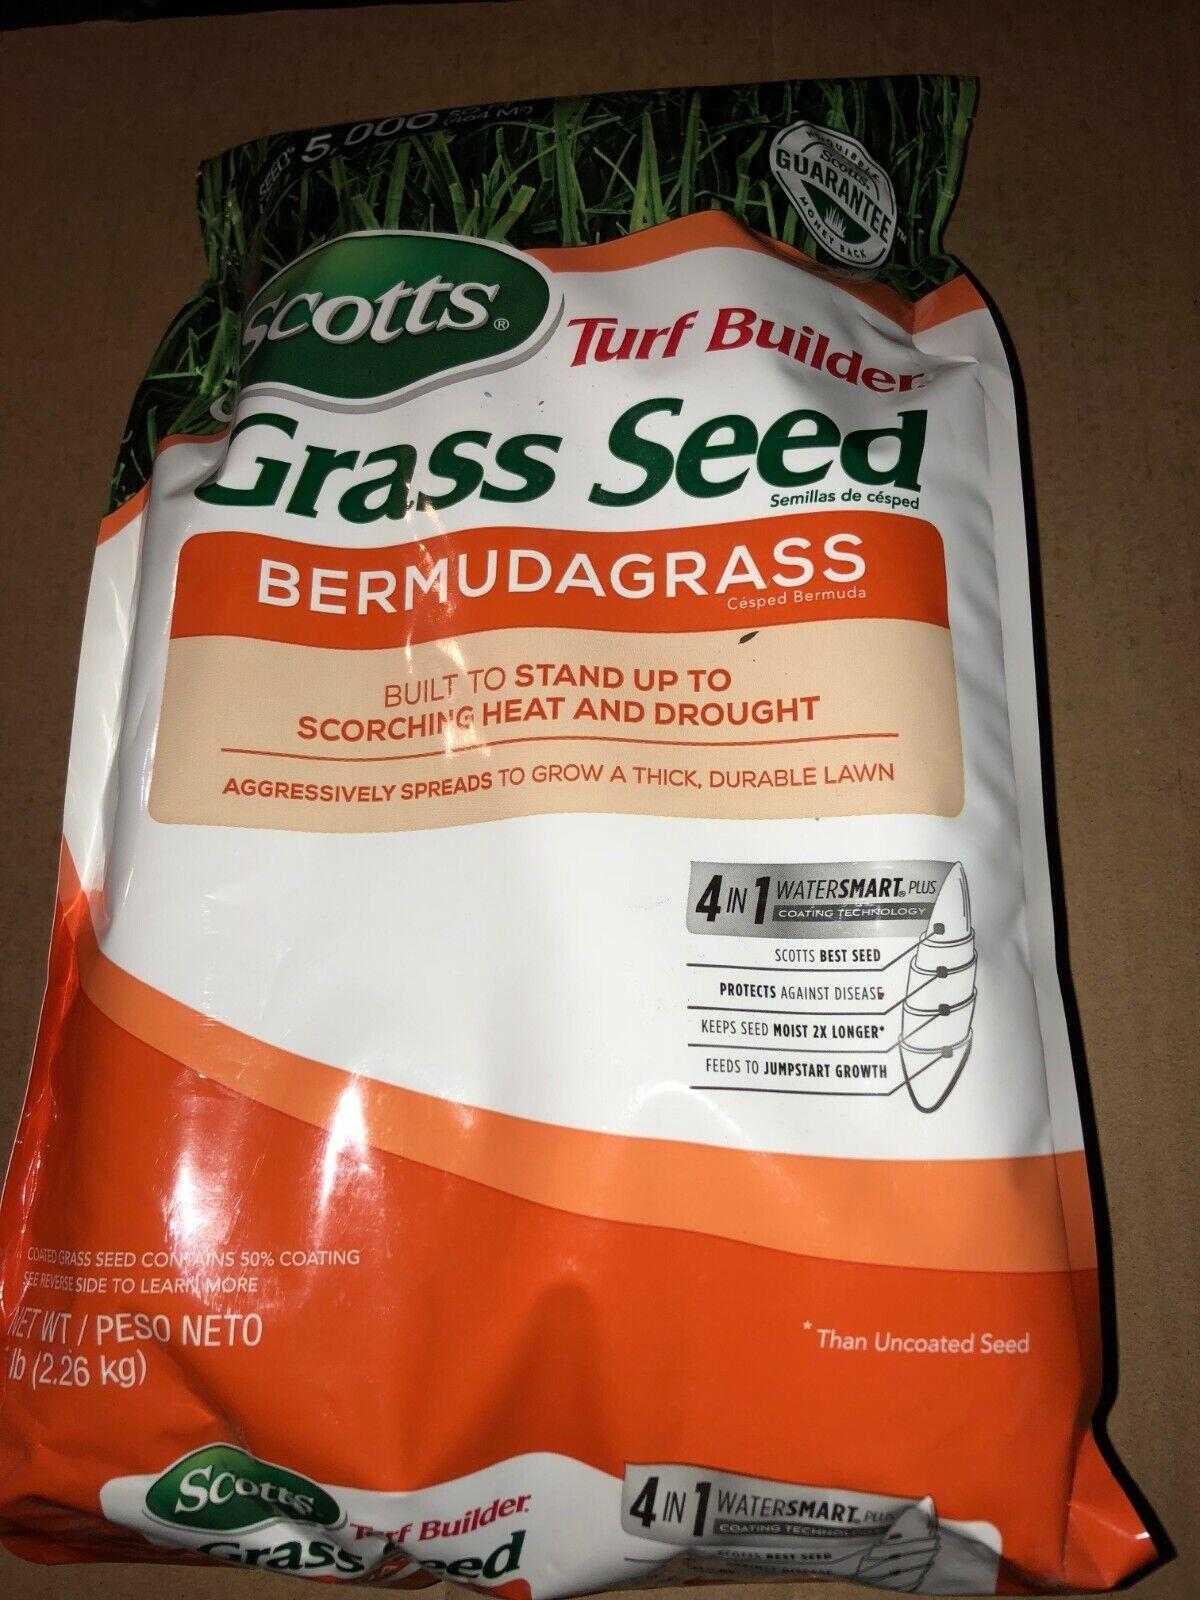 Scotts 18253 Turf Builder Bermuda Grass Seed Mix Bag 5 Pound For Sale Online Ebay